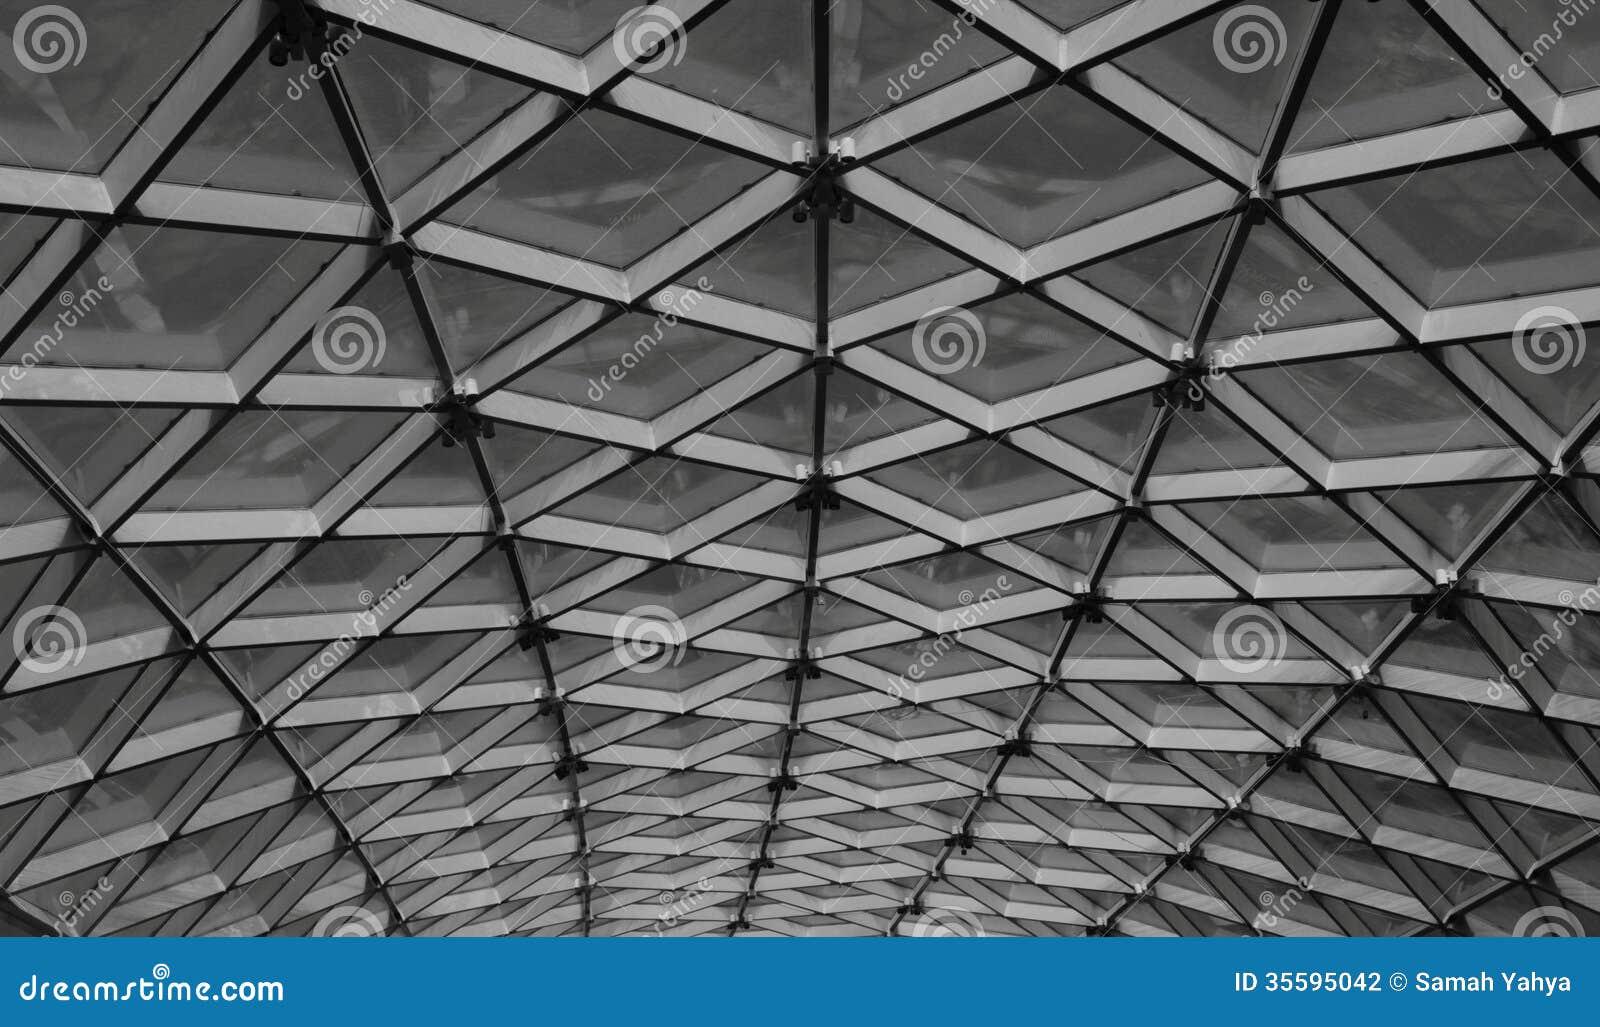 Skylight ceiling stock photo. Image of monochrome, steel - 35595042